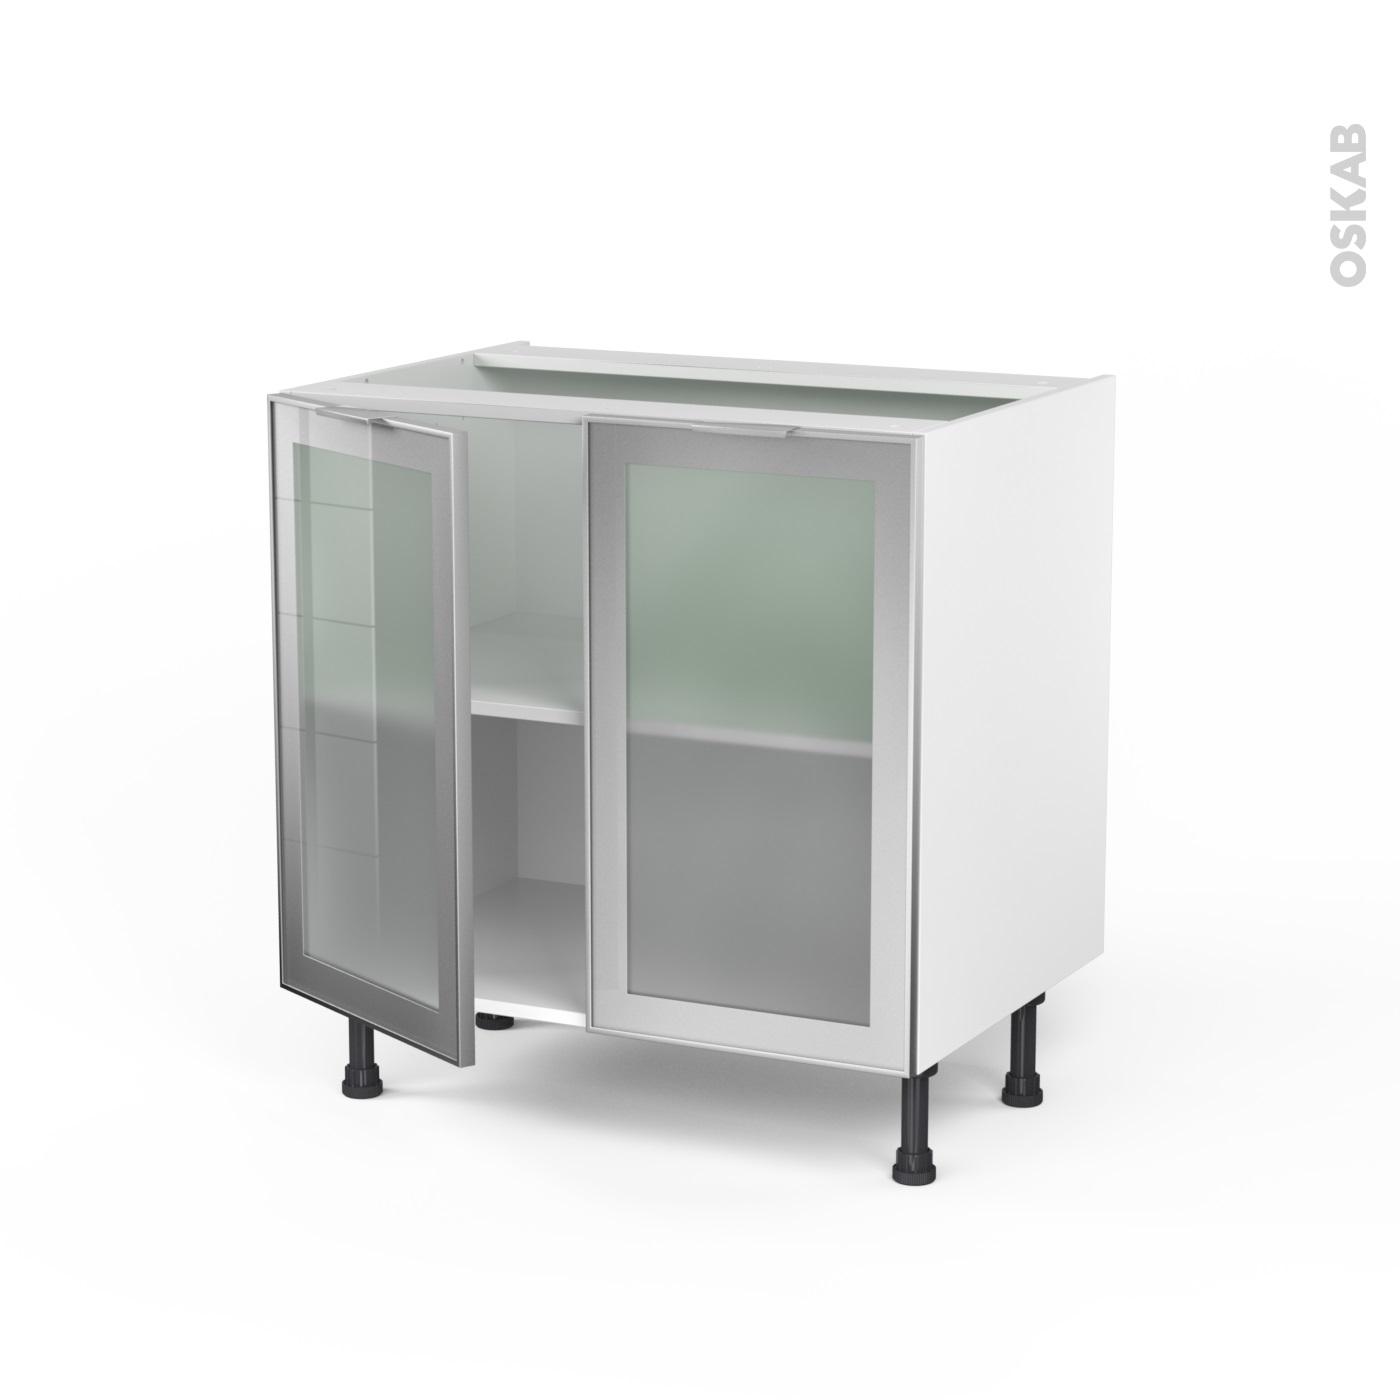 Meuble De Cuisine Bas Vitr Fa Ade Alu 2 Portes L80 X H70 X P58 Cm  # Meuble Bas Vitre Laque Blanc